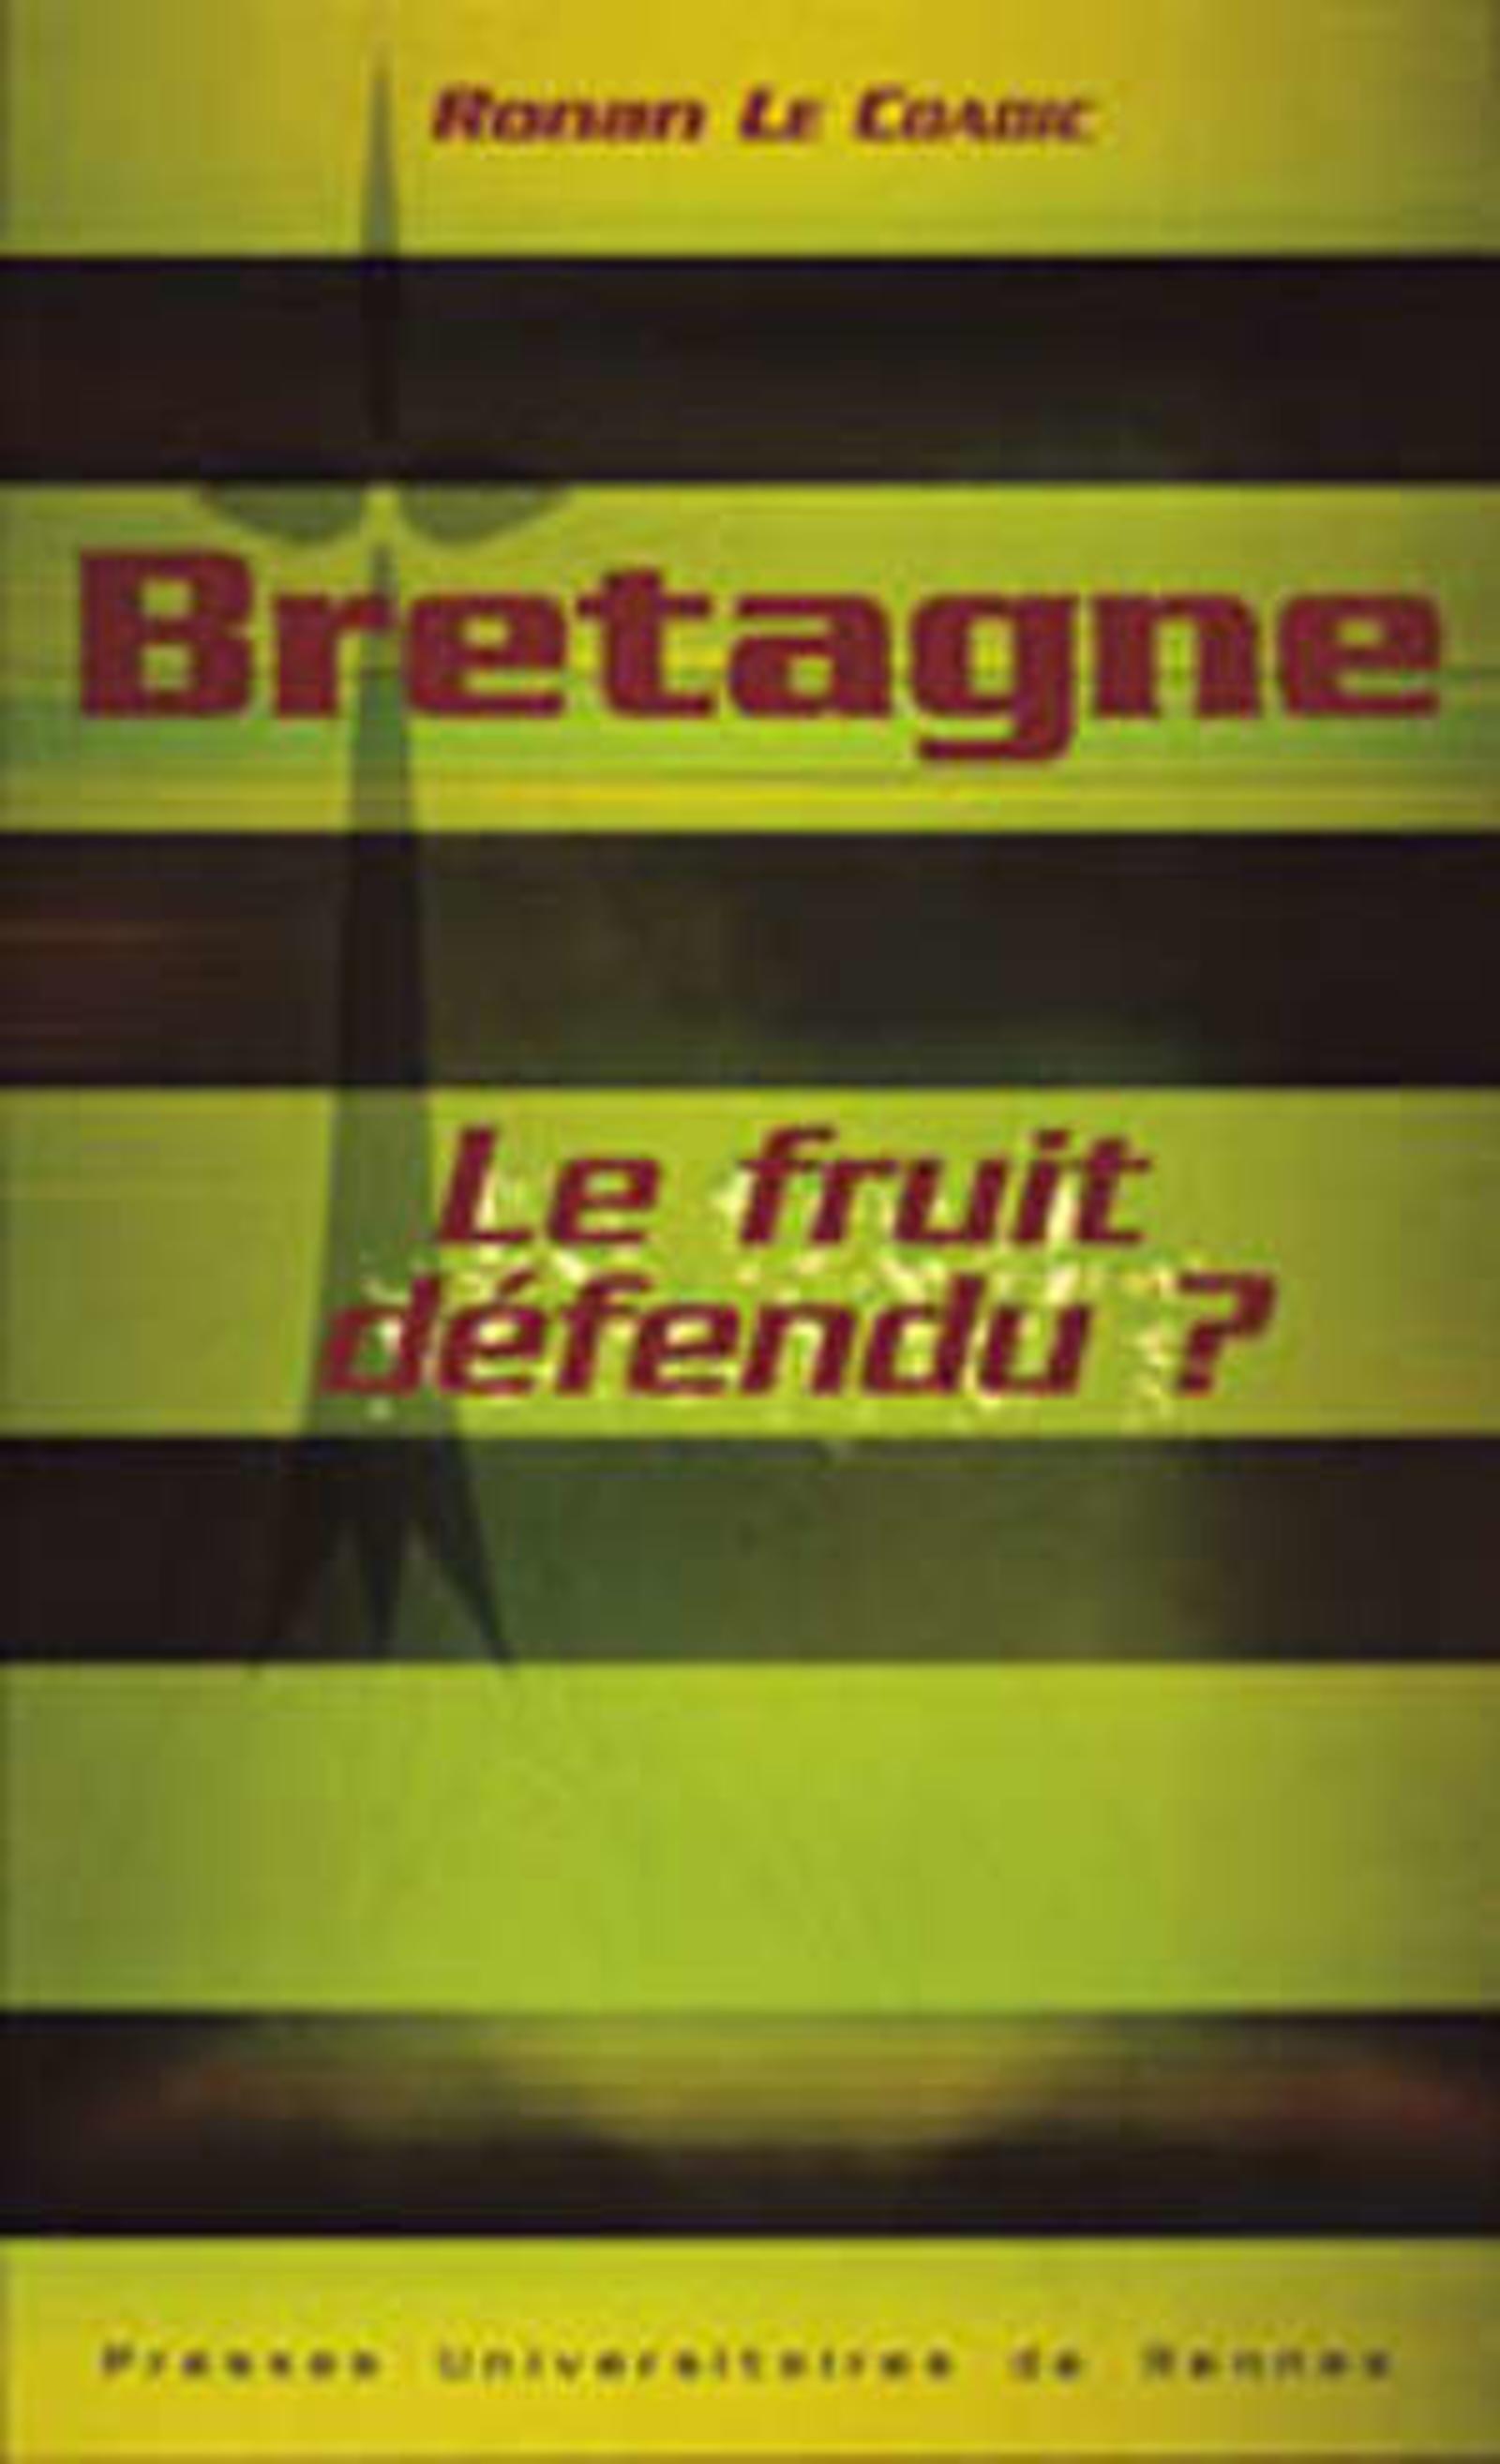 BRETAGNE, LE FRUIT DEFENDU ?